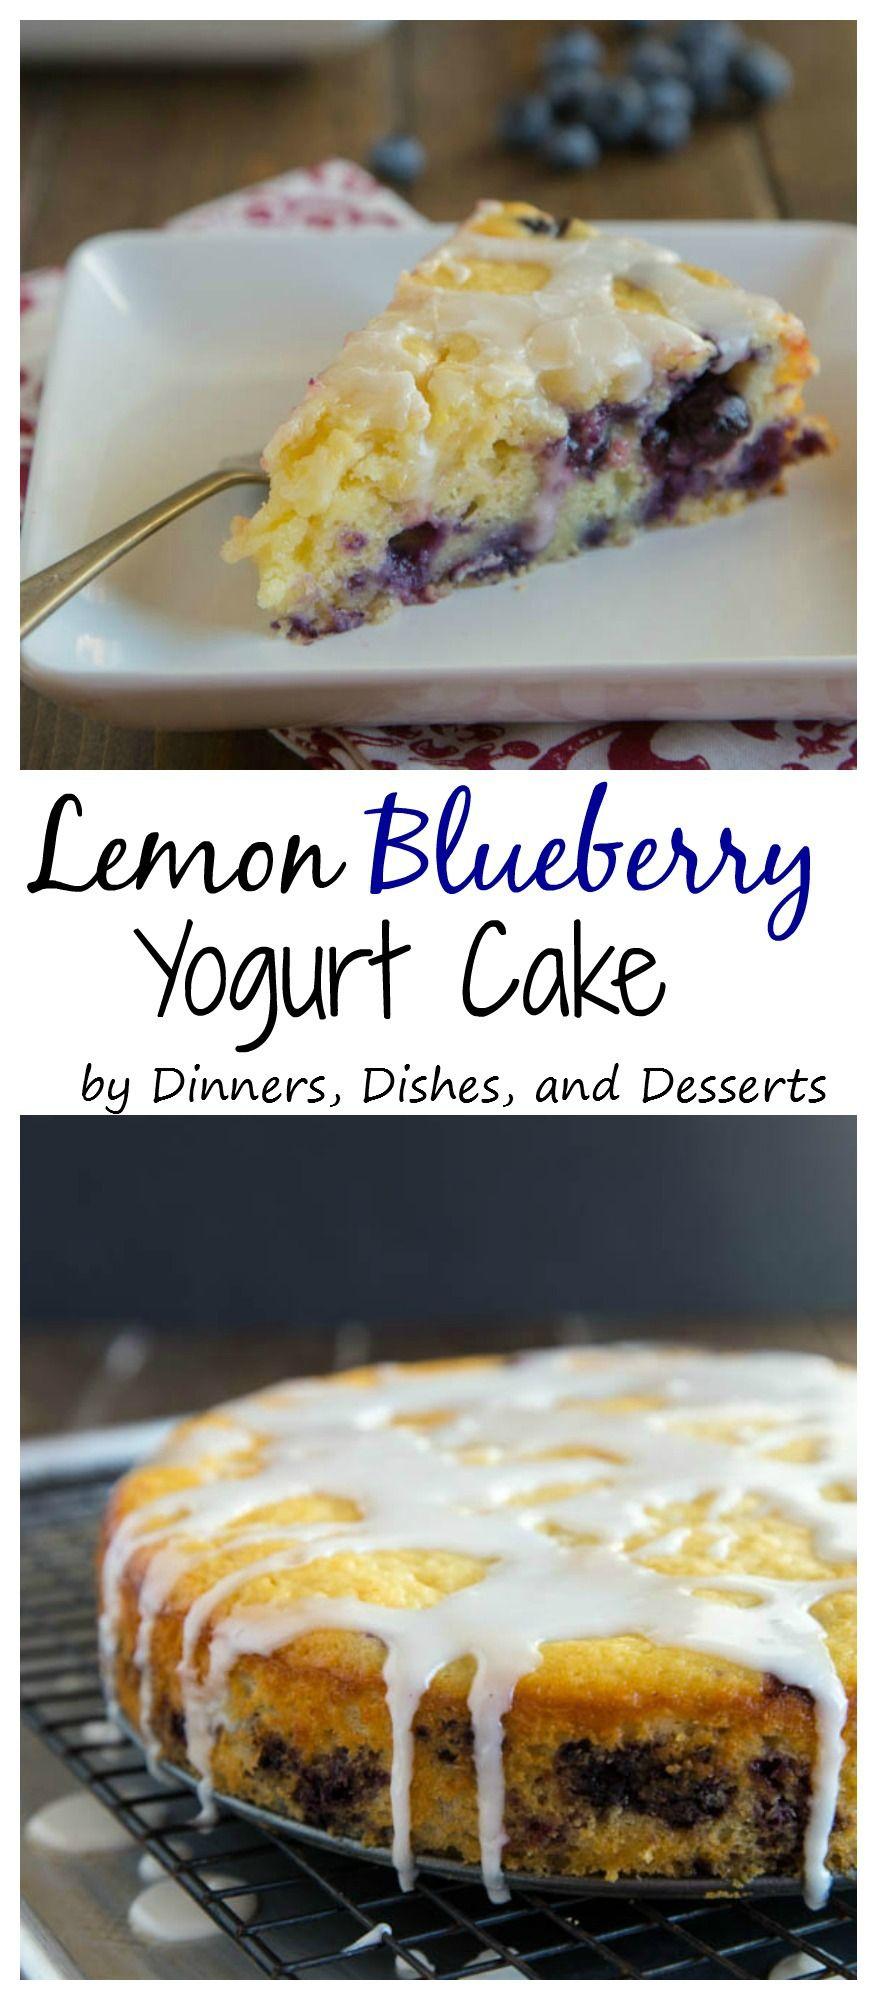 Lemon Blueberry Yogurt Cake A Super Moist Lemon Yogurt Cake